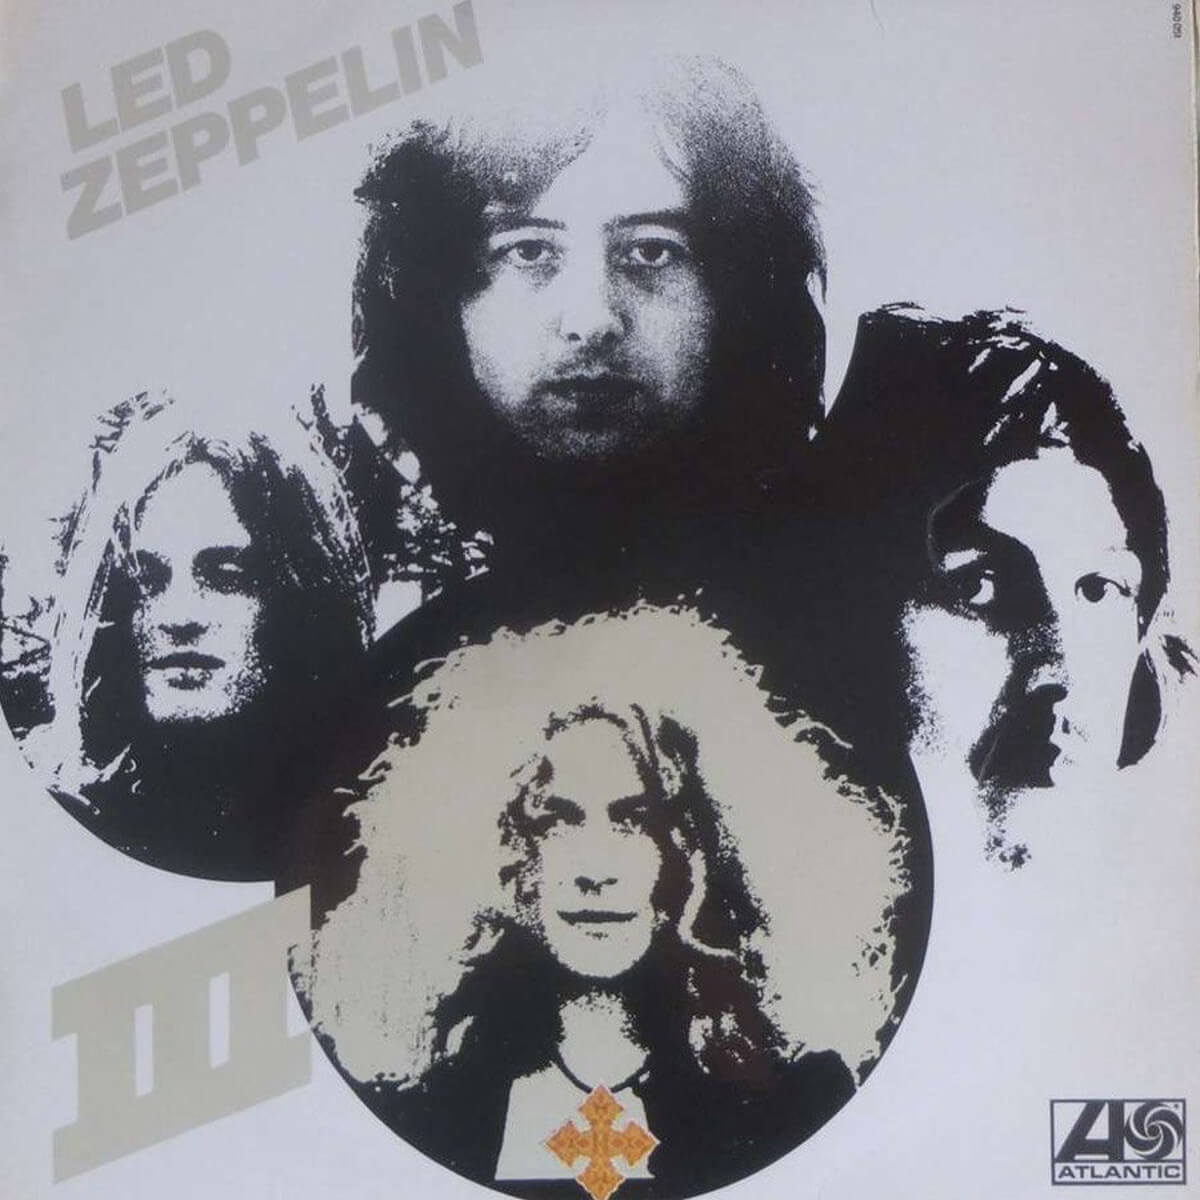 Arte del álbum de Led Zeppelin